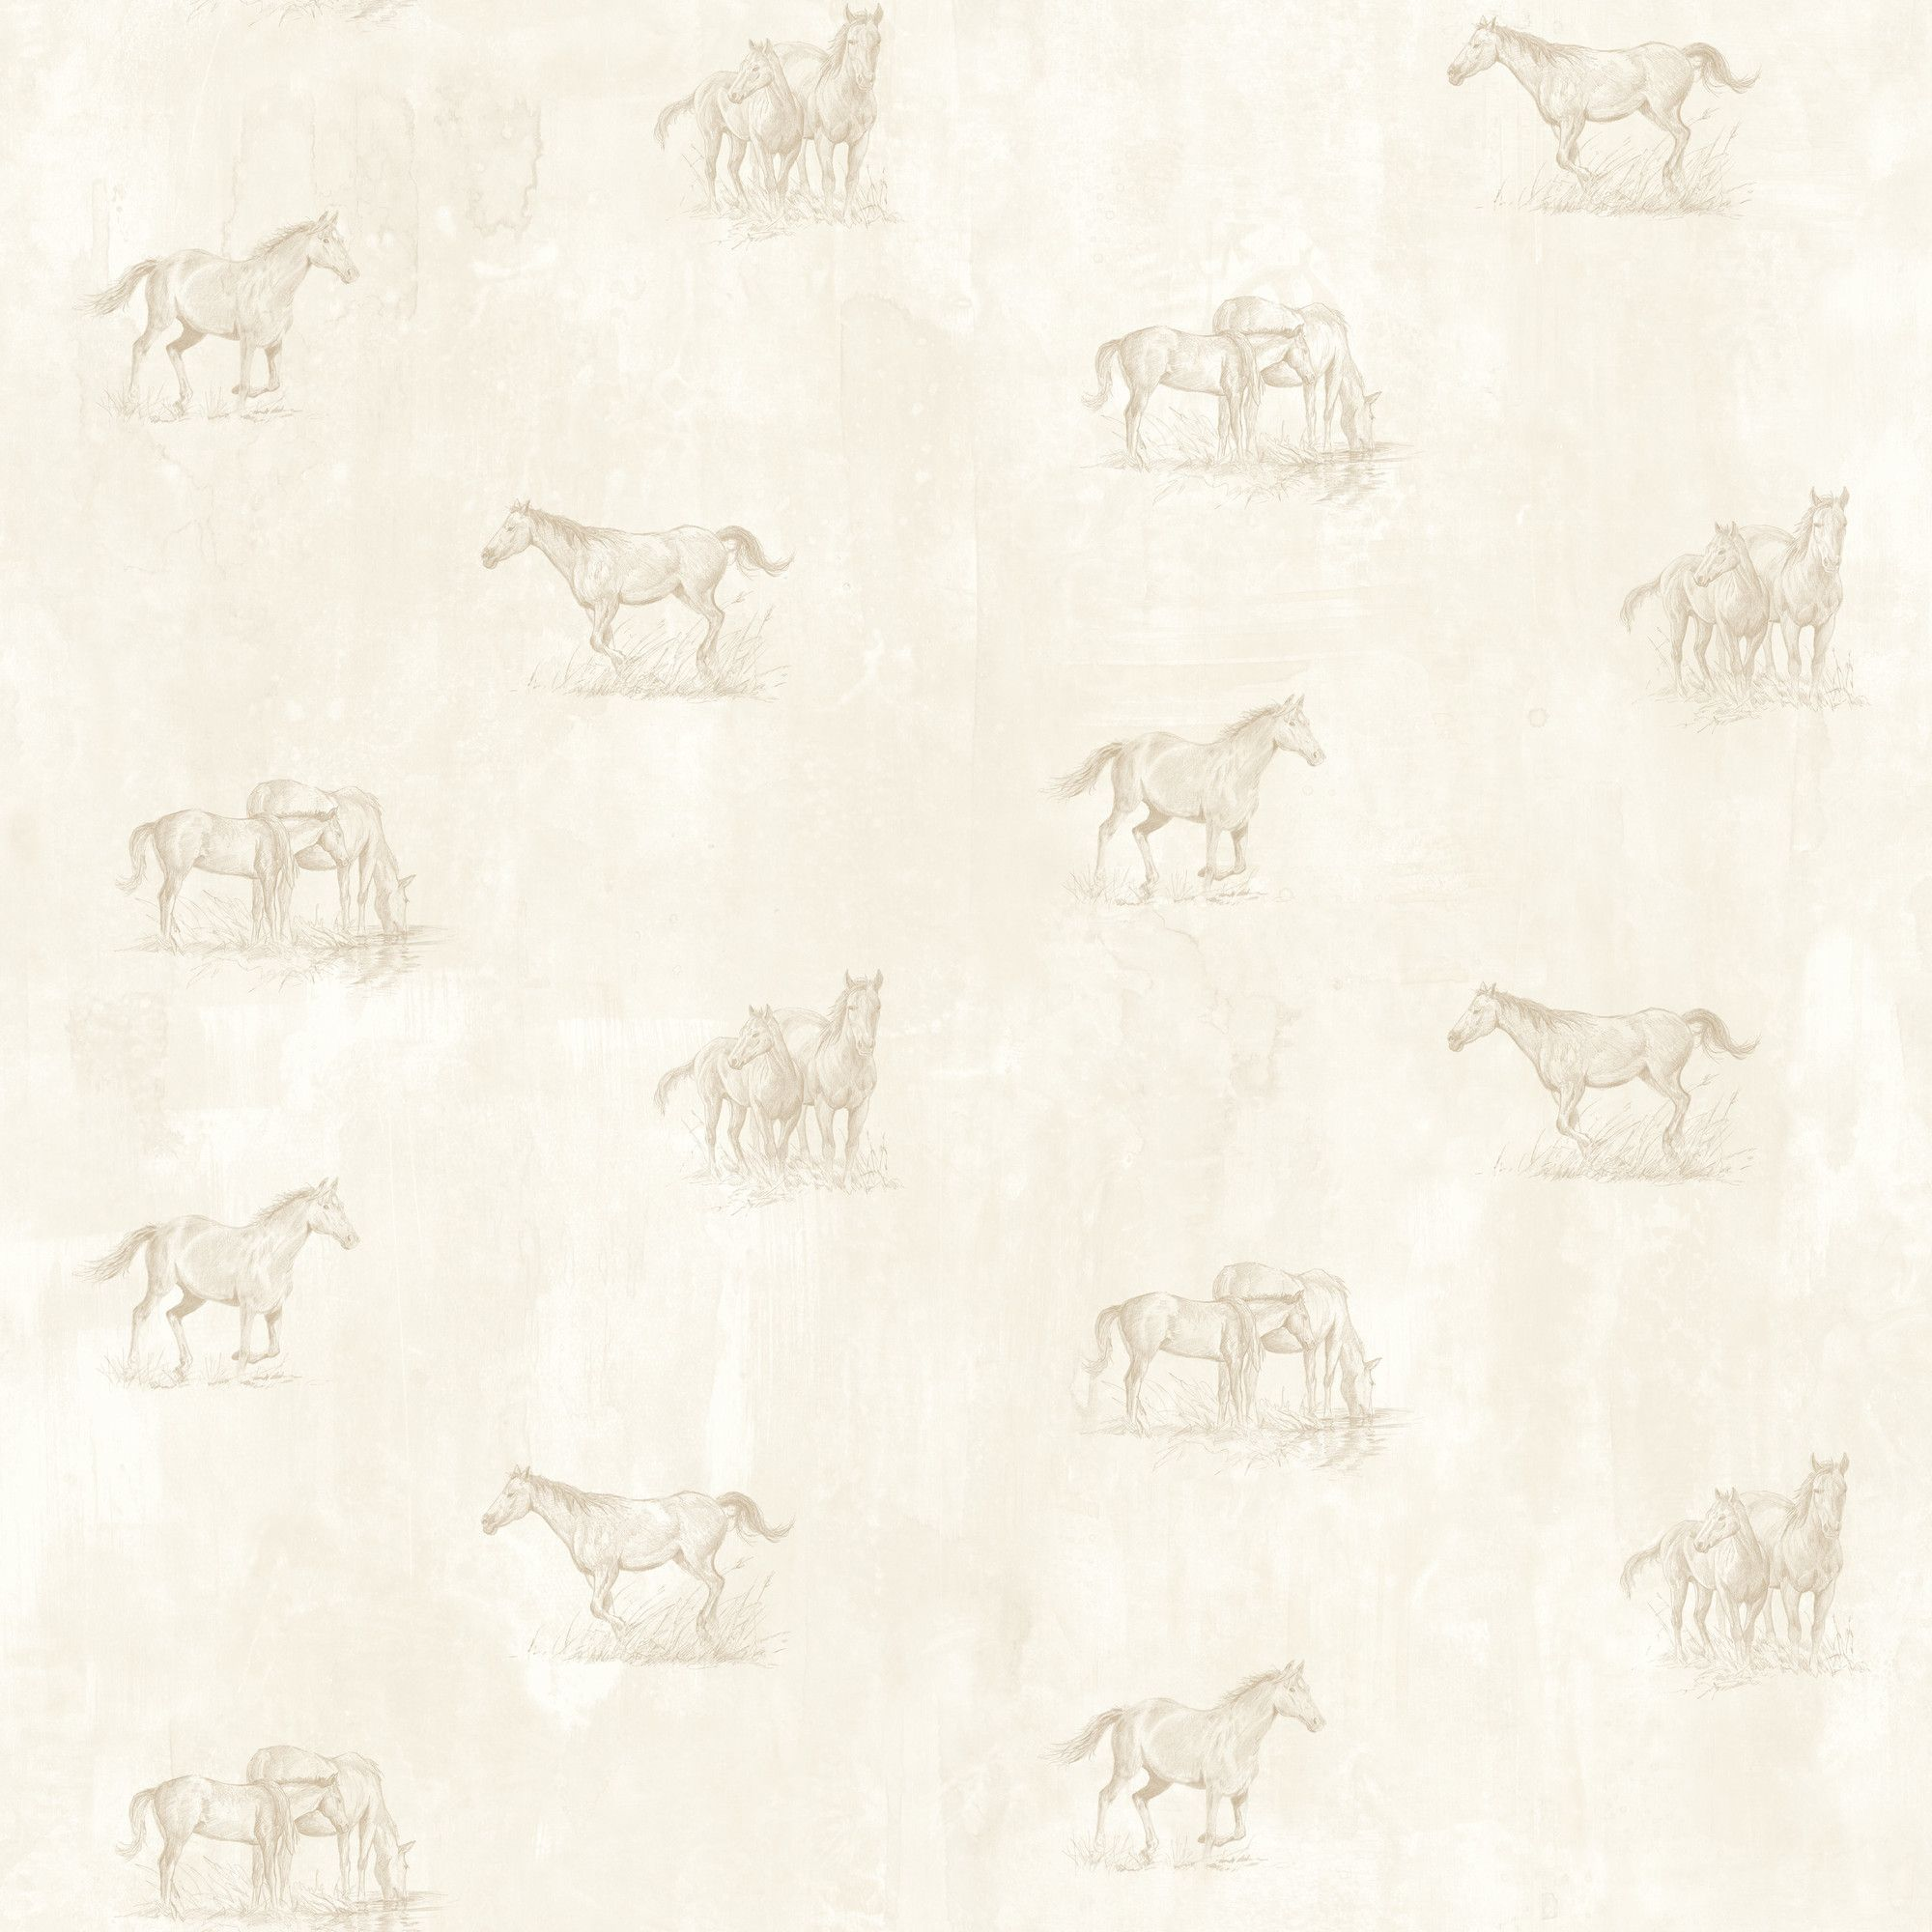 "Outdoors Doodles Sketch Toss 33' X 20.5"" Horse 3D Embossed"